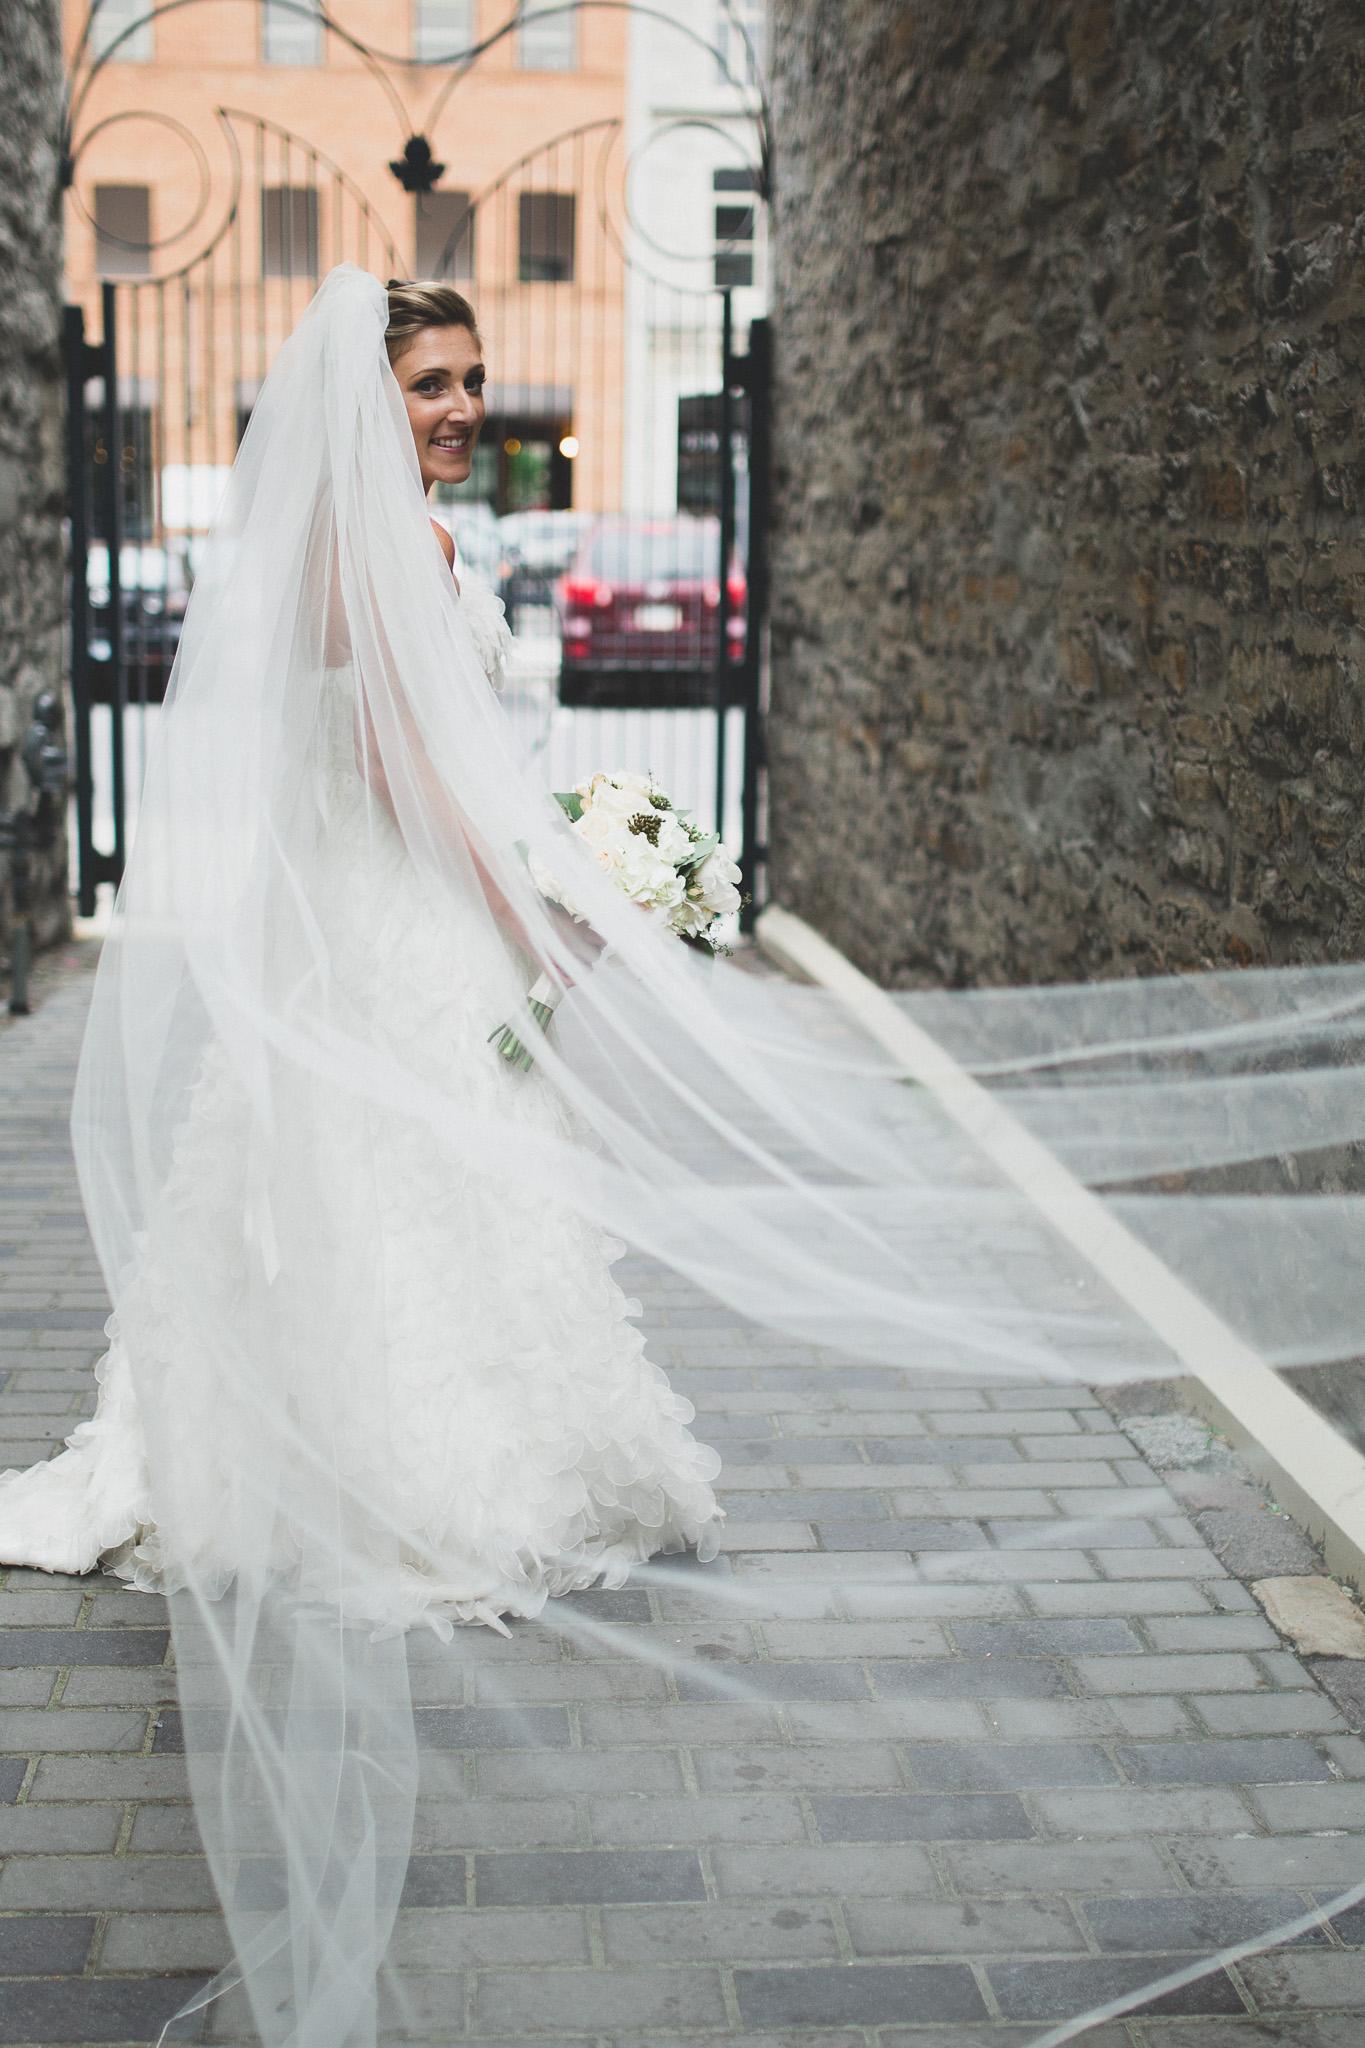 bridal-portraits-with-veil